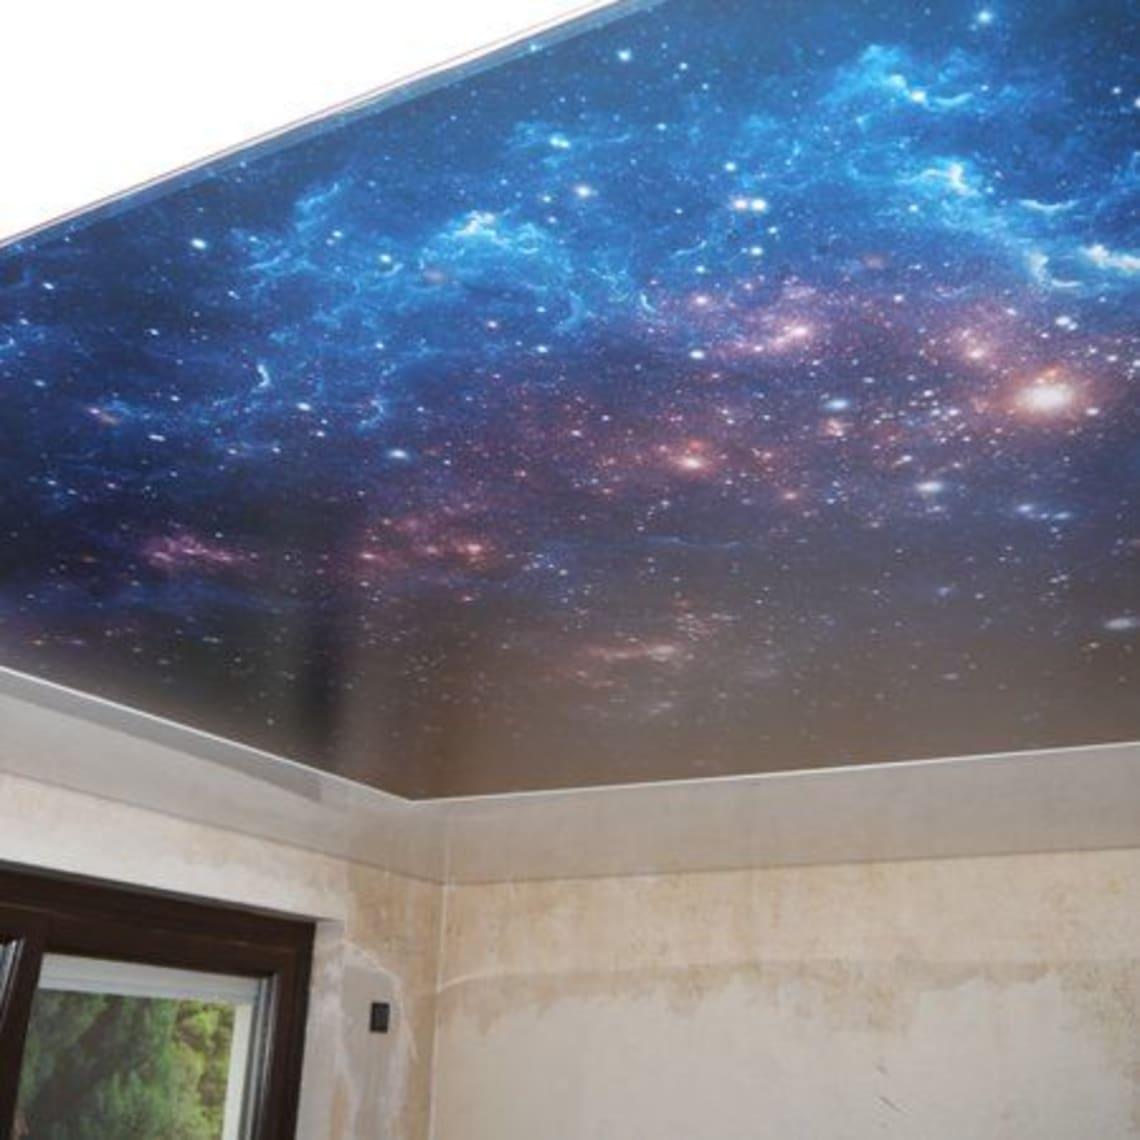 Bedruckte Lichtdecke Sternenhimmel